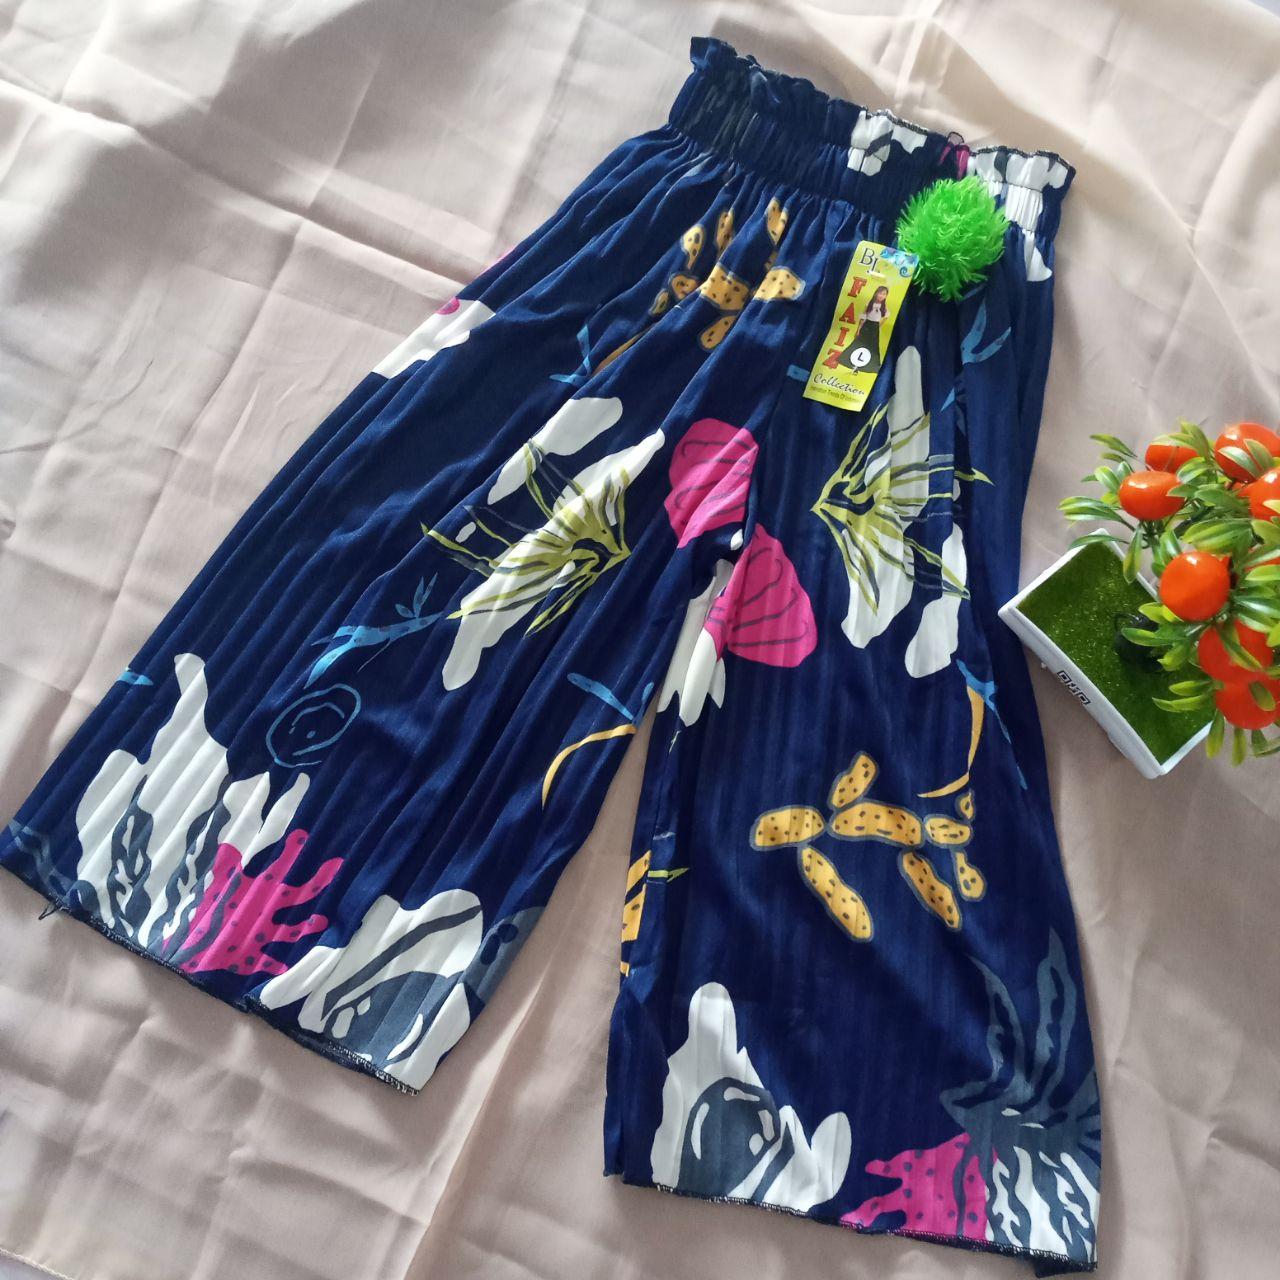 ini adalah Kulot Plisket Anak Motif Navy, size: Long 64 cm, material: Jersey, color: Nevy, brand: BajuAnakindonesia, age_group: kids, gender: unisex